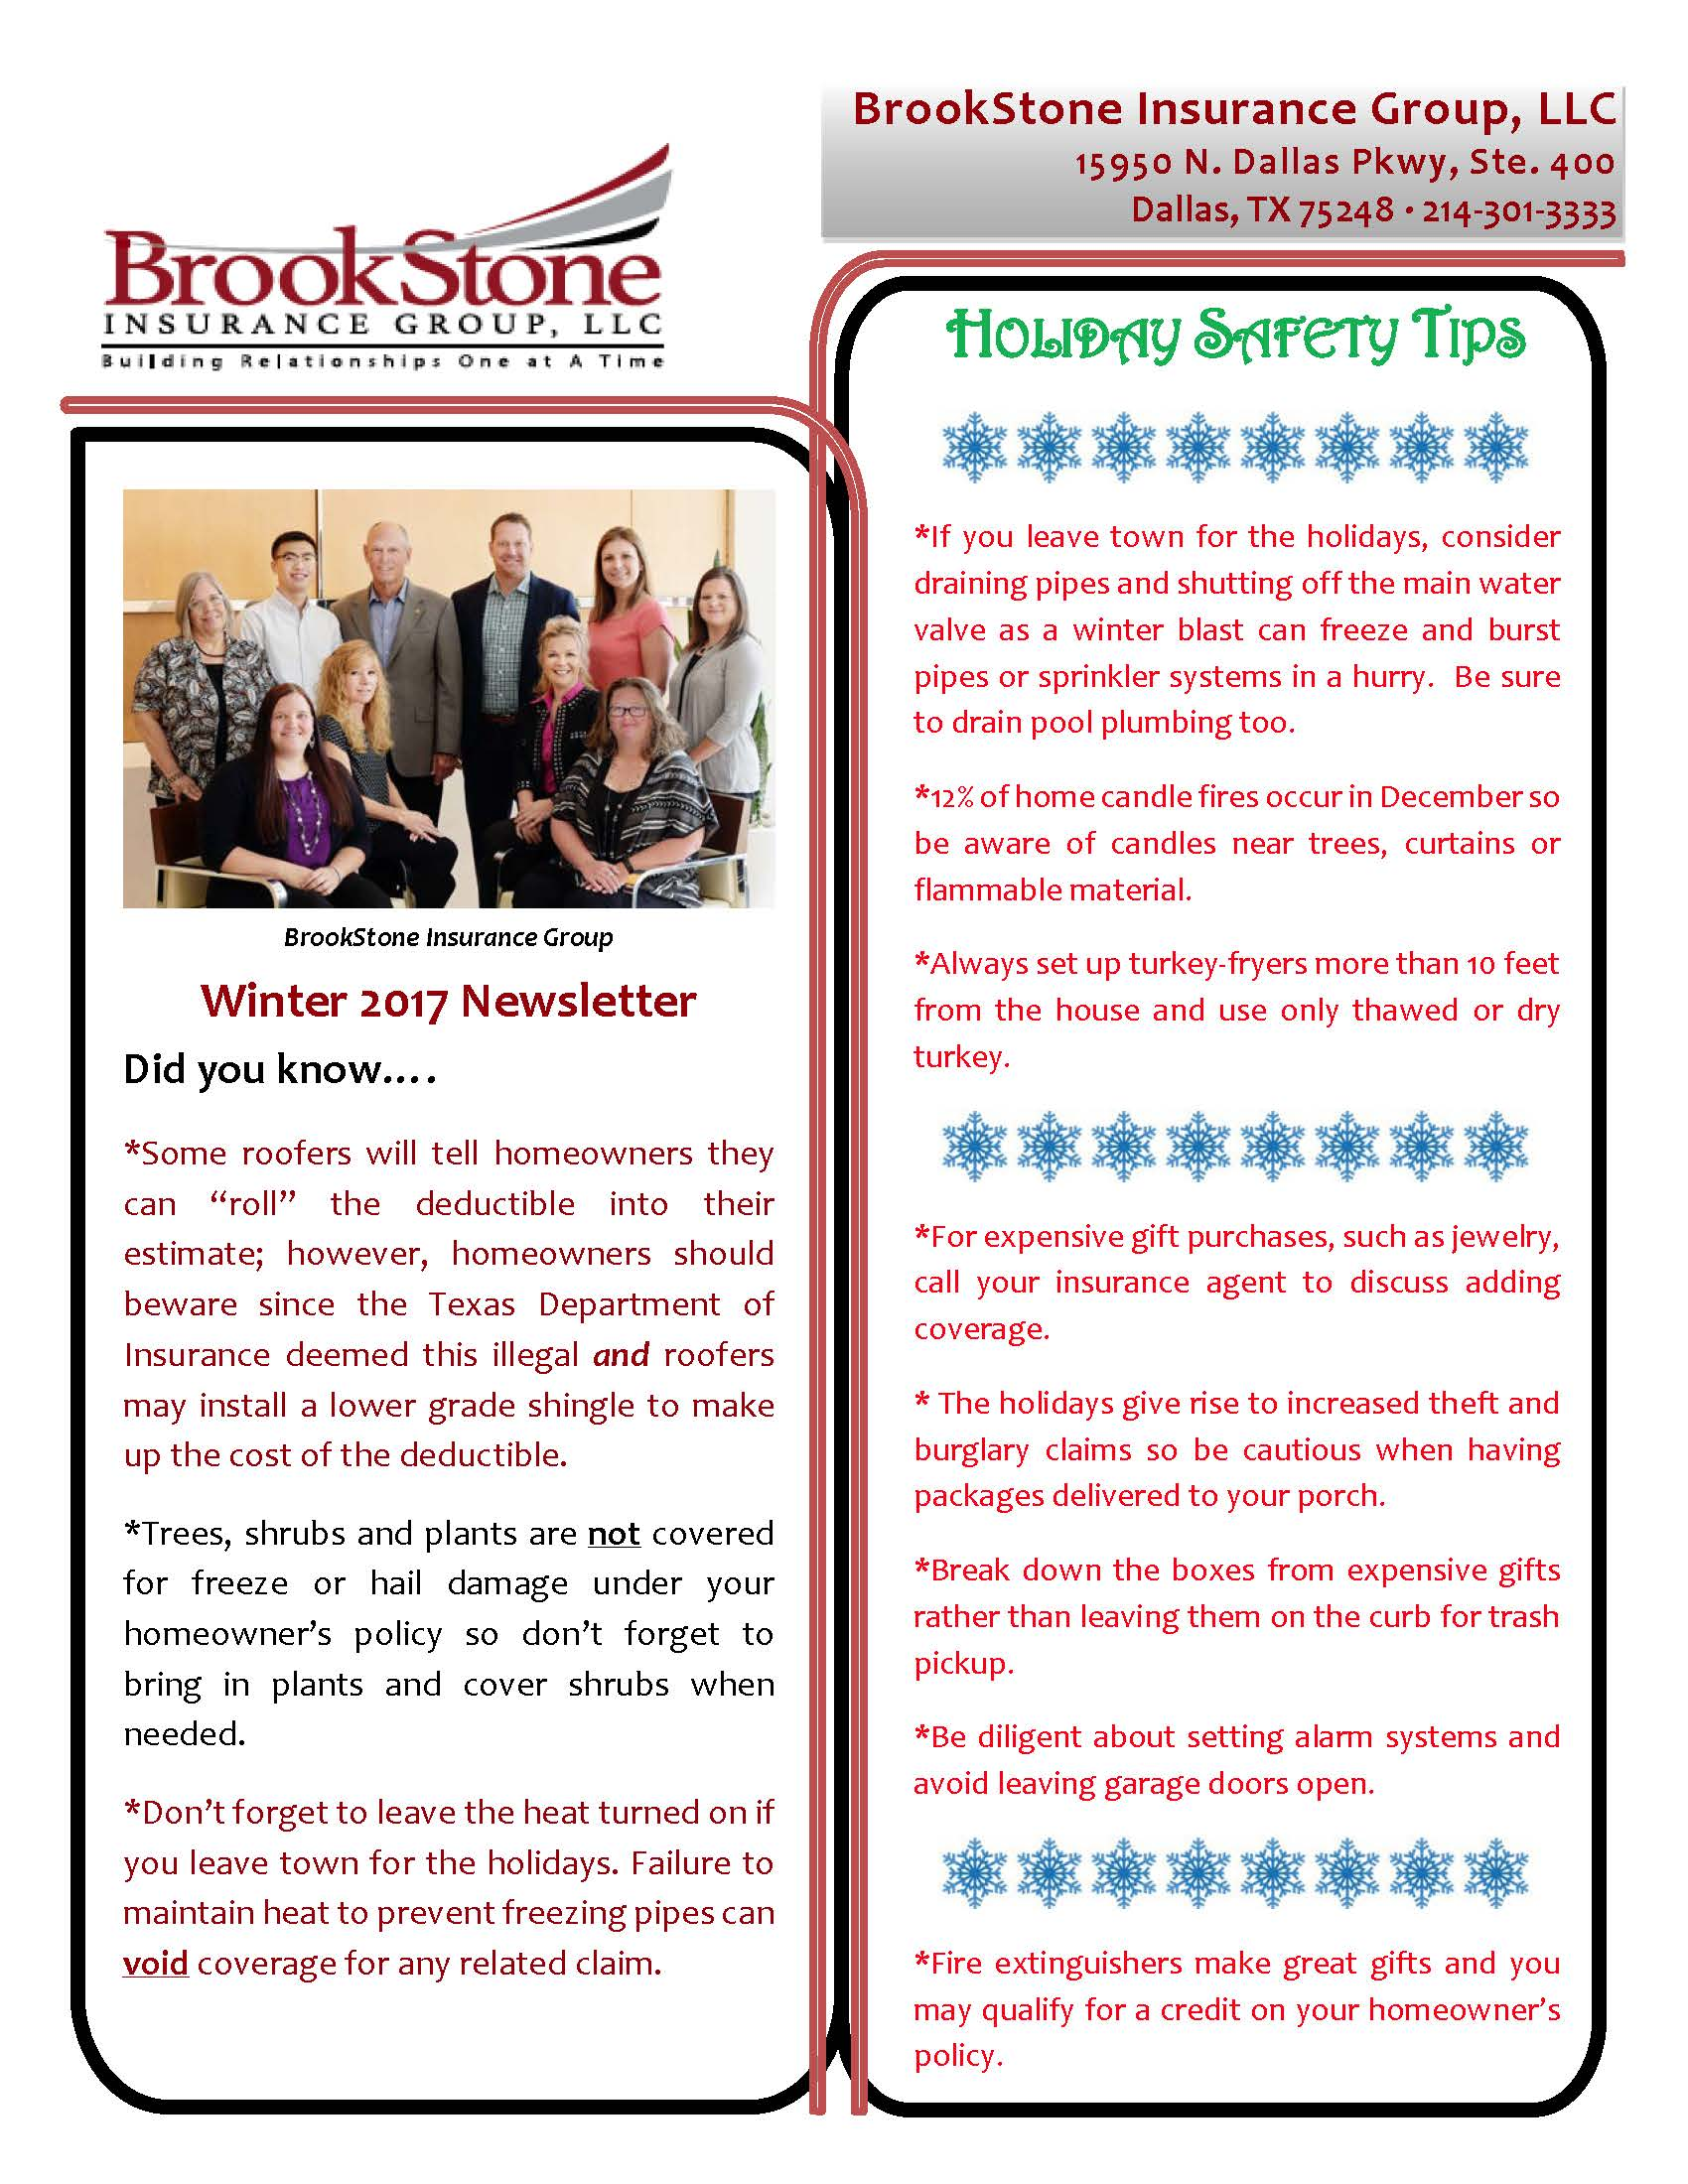 Holiday Safety Tips - BrookStone Insurance Group, LLC